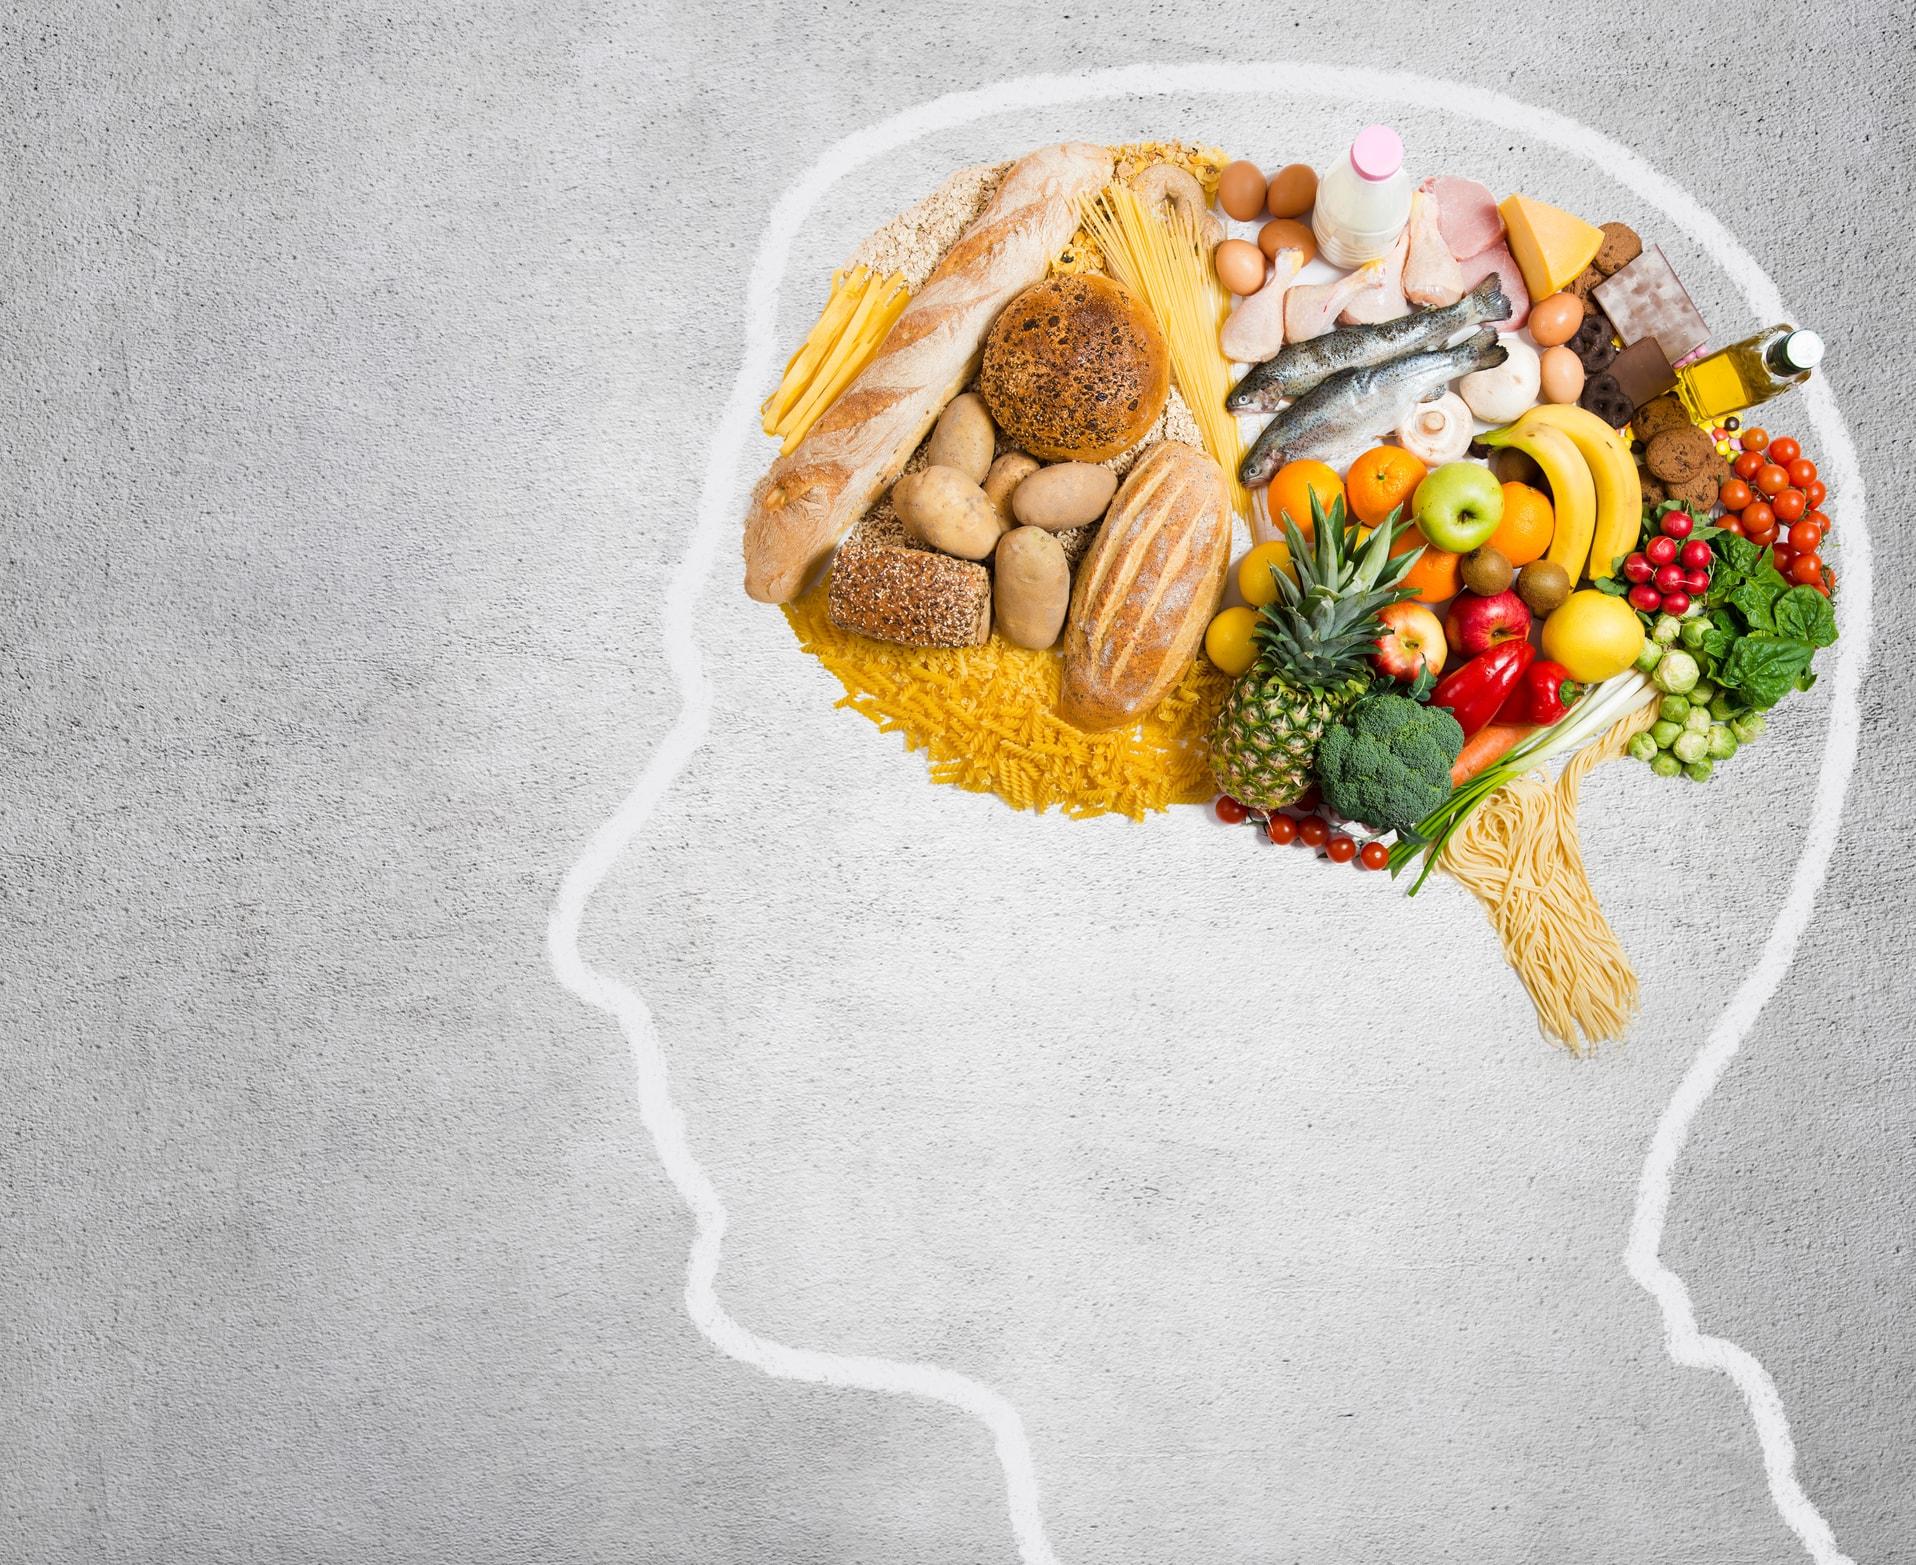 Gesunde Ernährung hilft gegen Pickel am Rücken